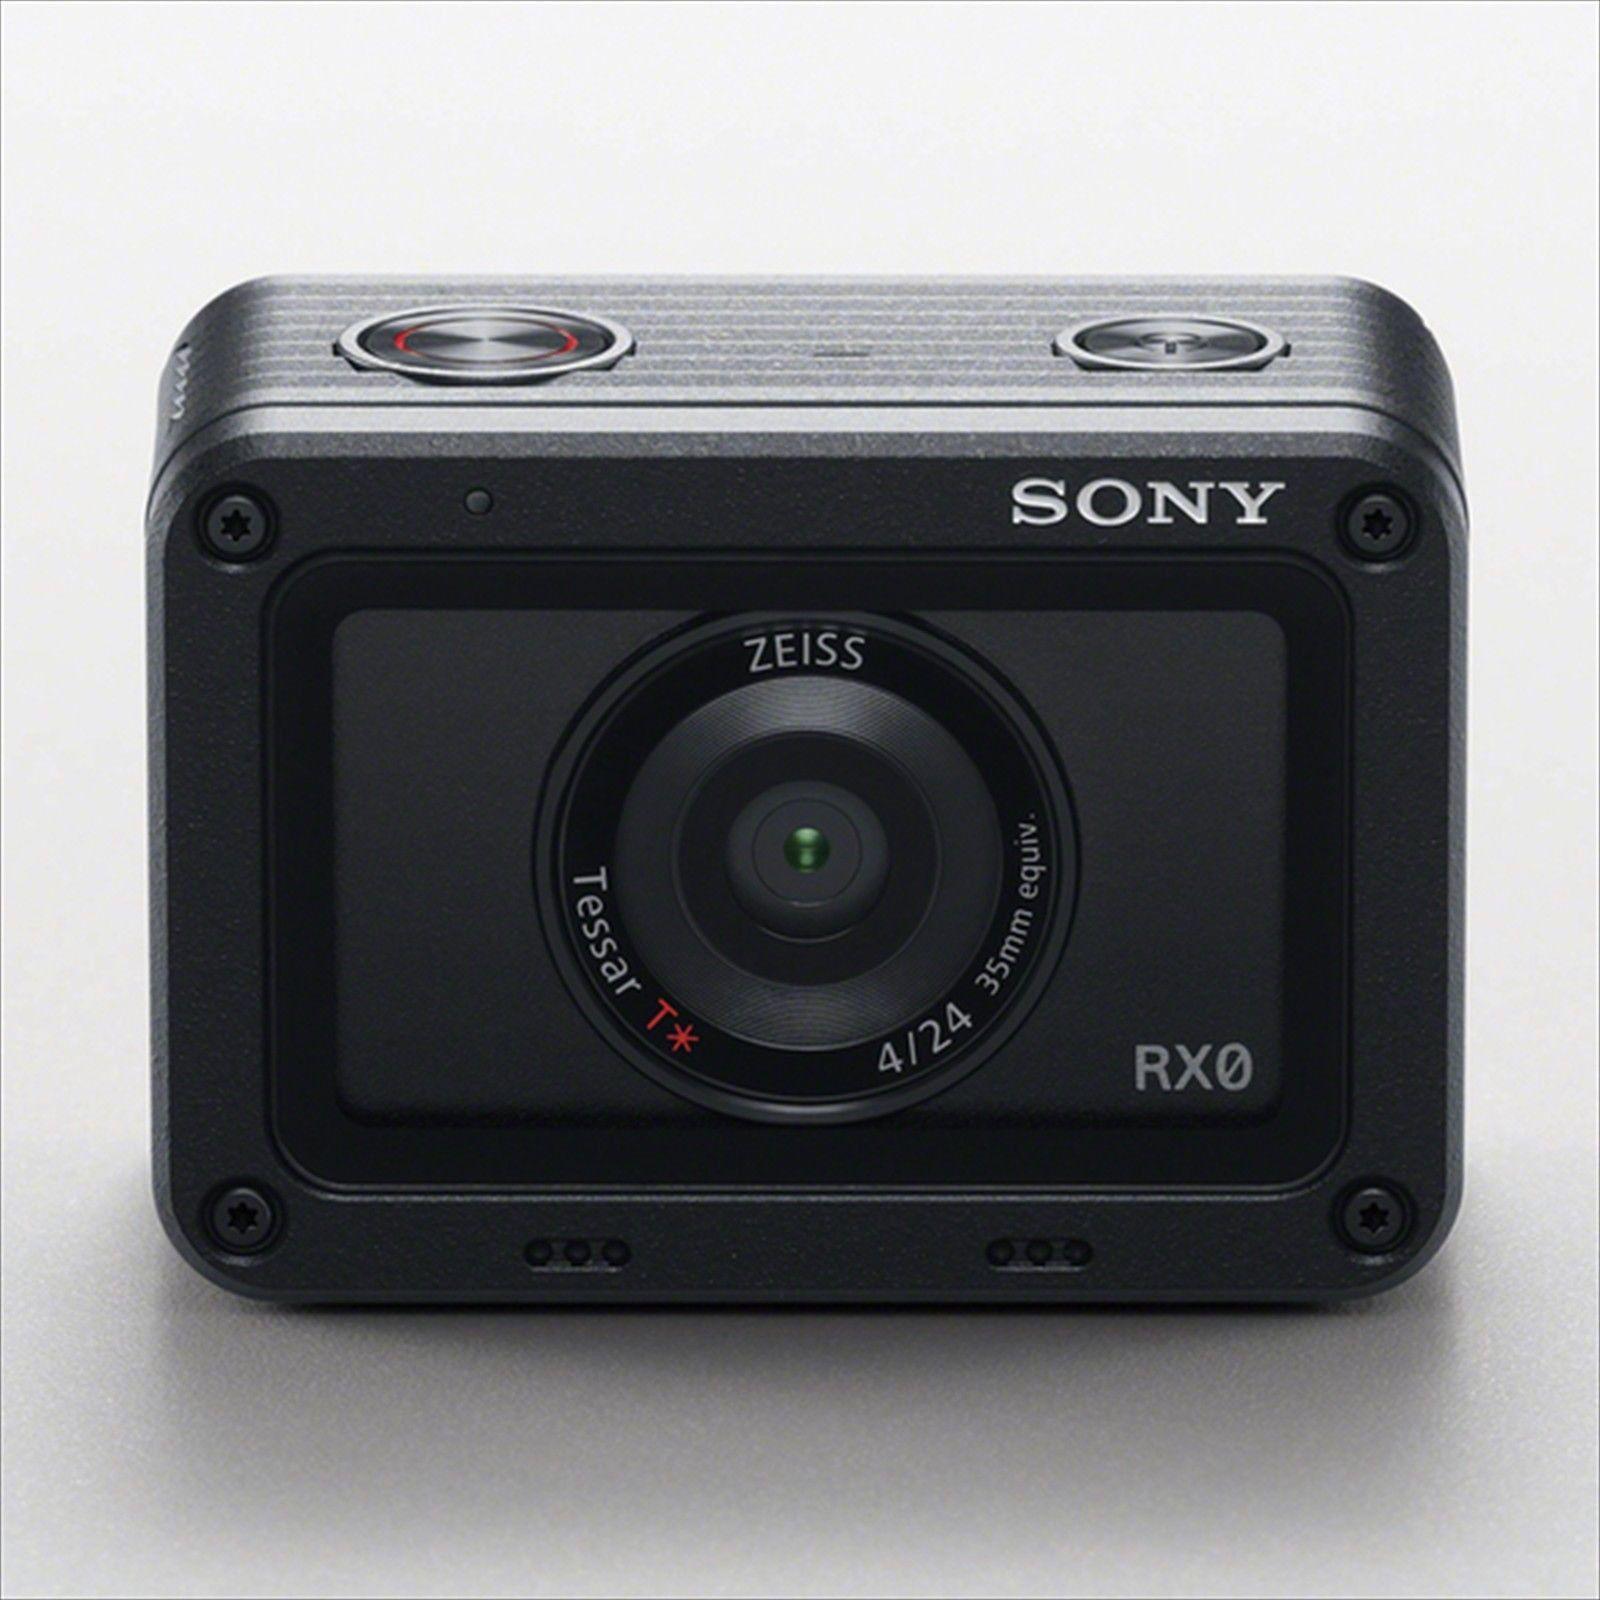 BRAND NEW SONY Cyber-shot Digital Still Waterproof Ultra Compact ...